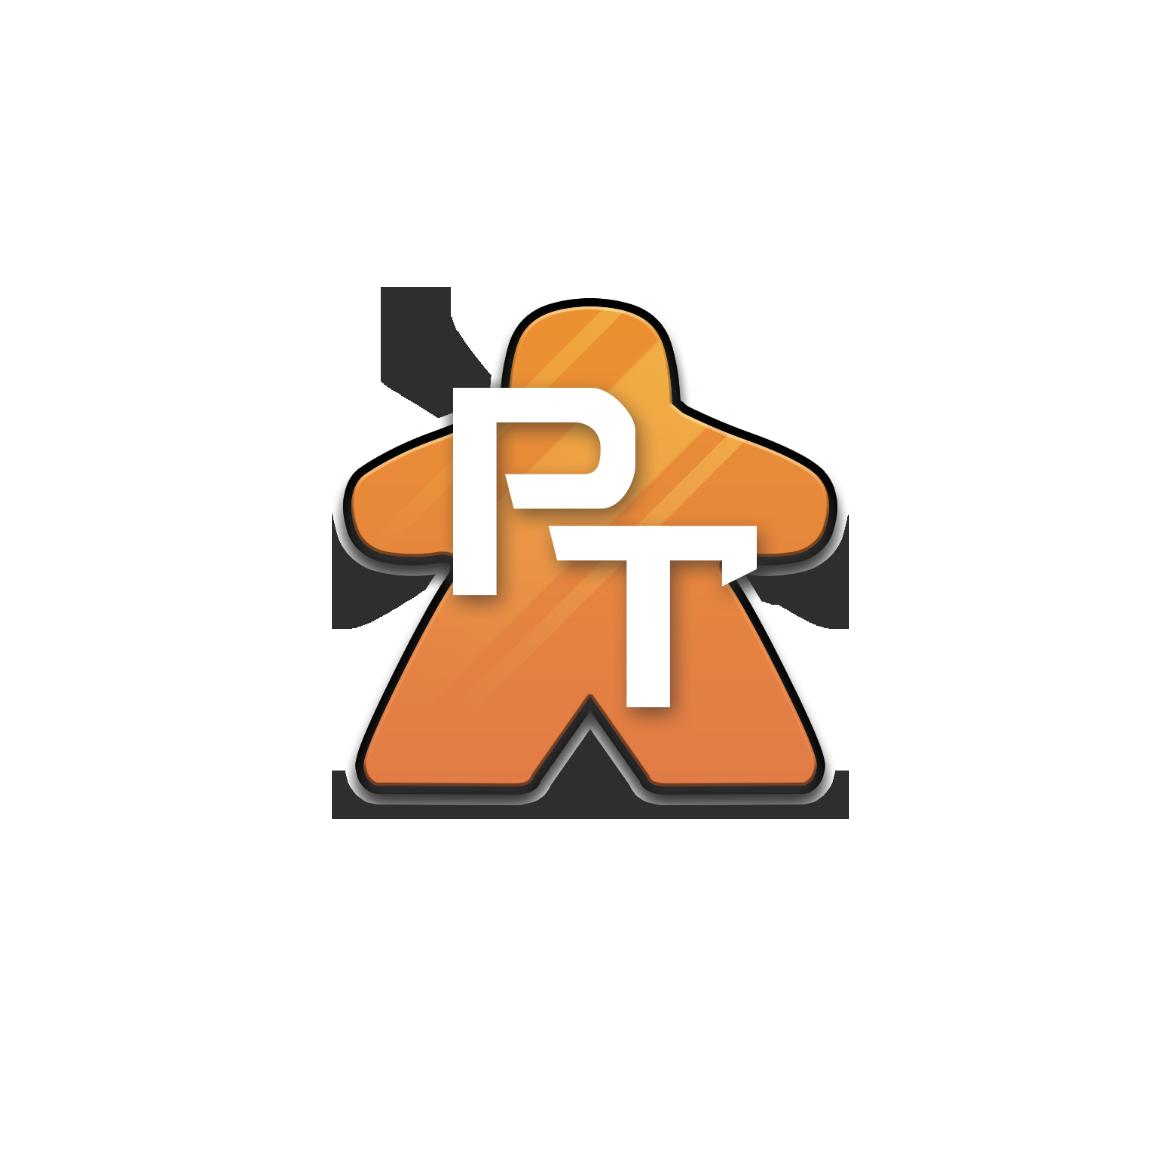 Image Pepper Titan Inc Emblemg Atlas Reactor Wiki Fandom